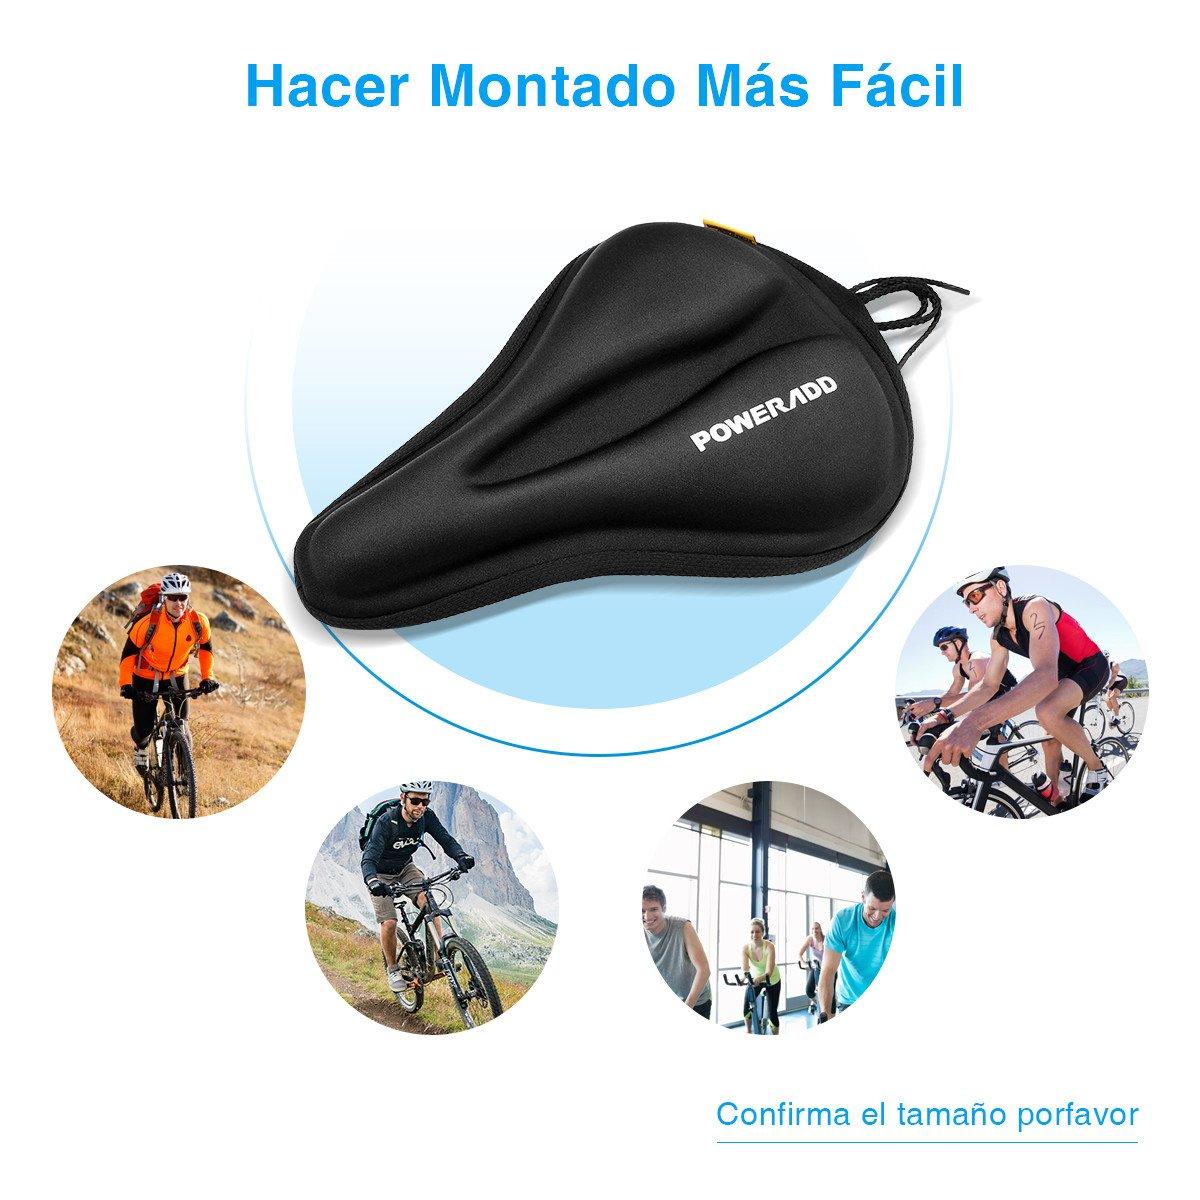 Poweradd Asiento de Bicicleta de Gel, Cubierta para Sillín de Bicicleta, Cómodo Acolchado, Cojín de Silicona de Bicicleta, para Bicicleta de Montaña-Negro: ...